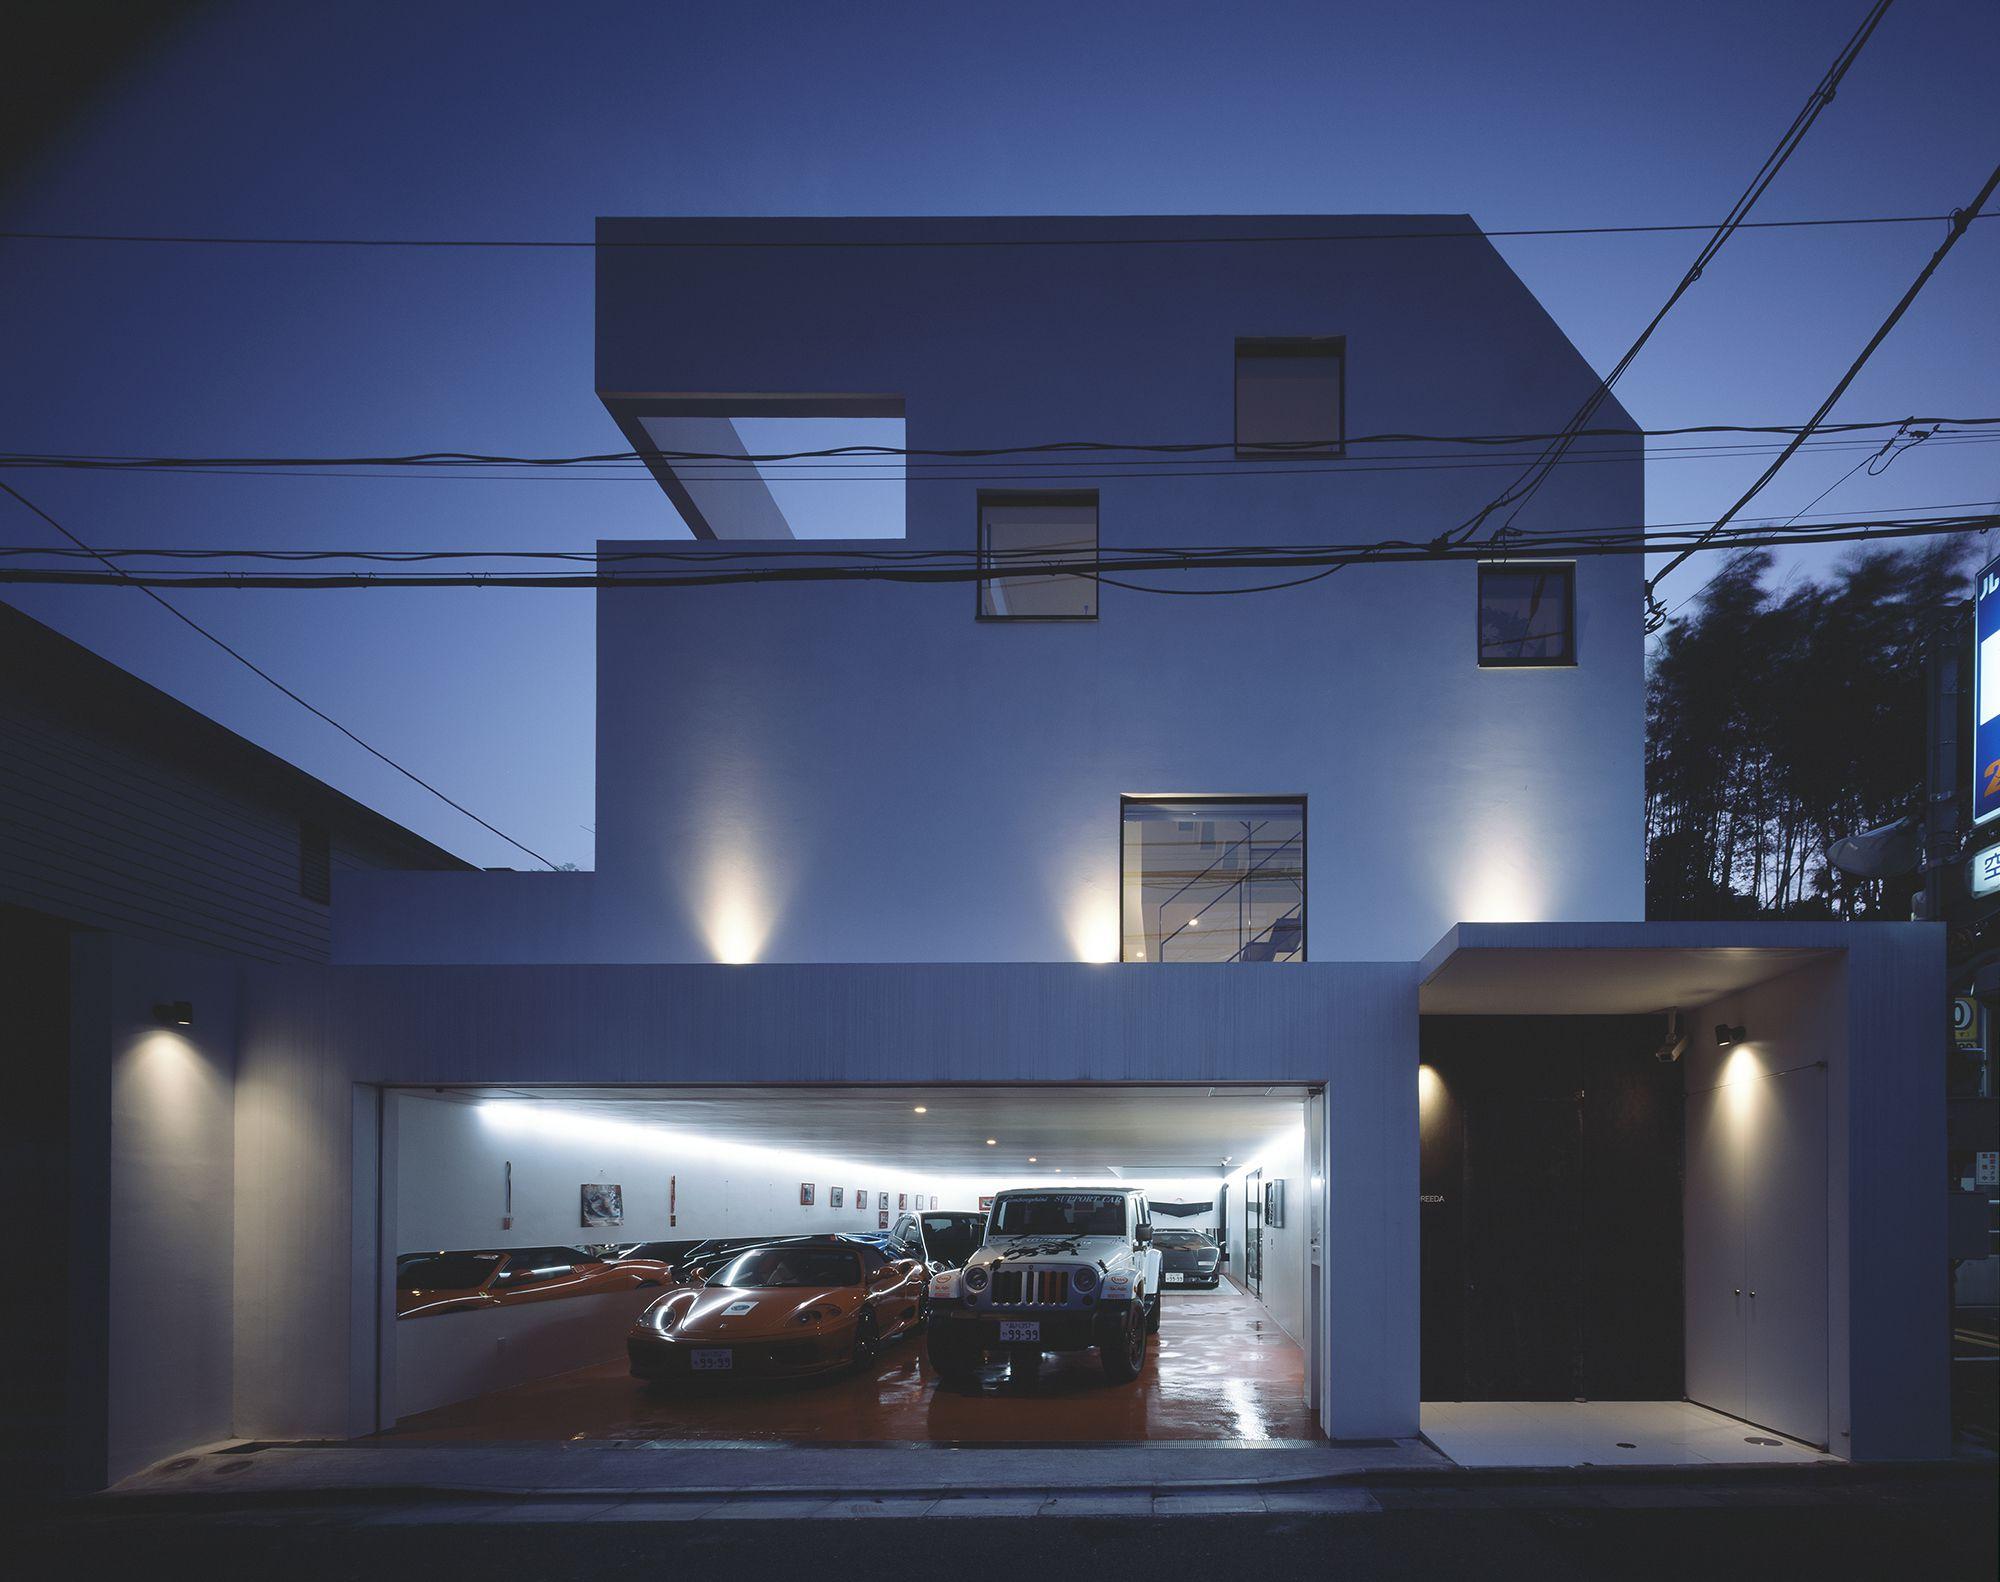 KRE the house floating room by no.555 Tsuchida Takuya